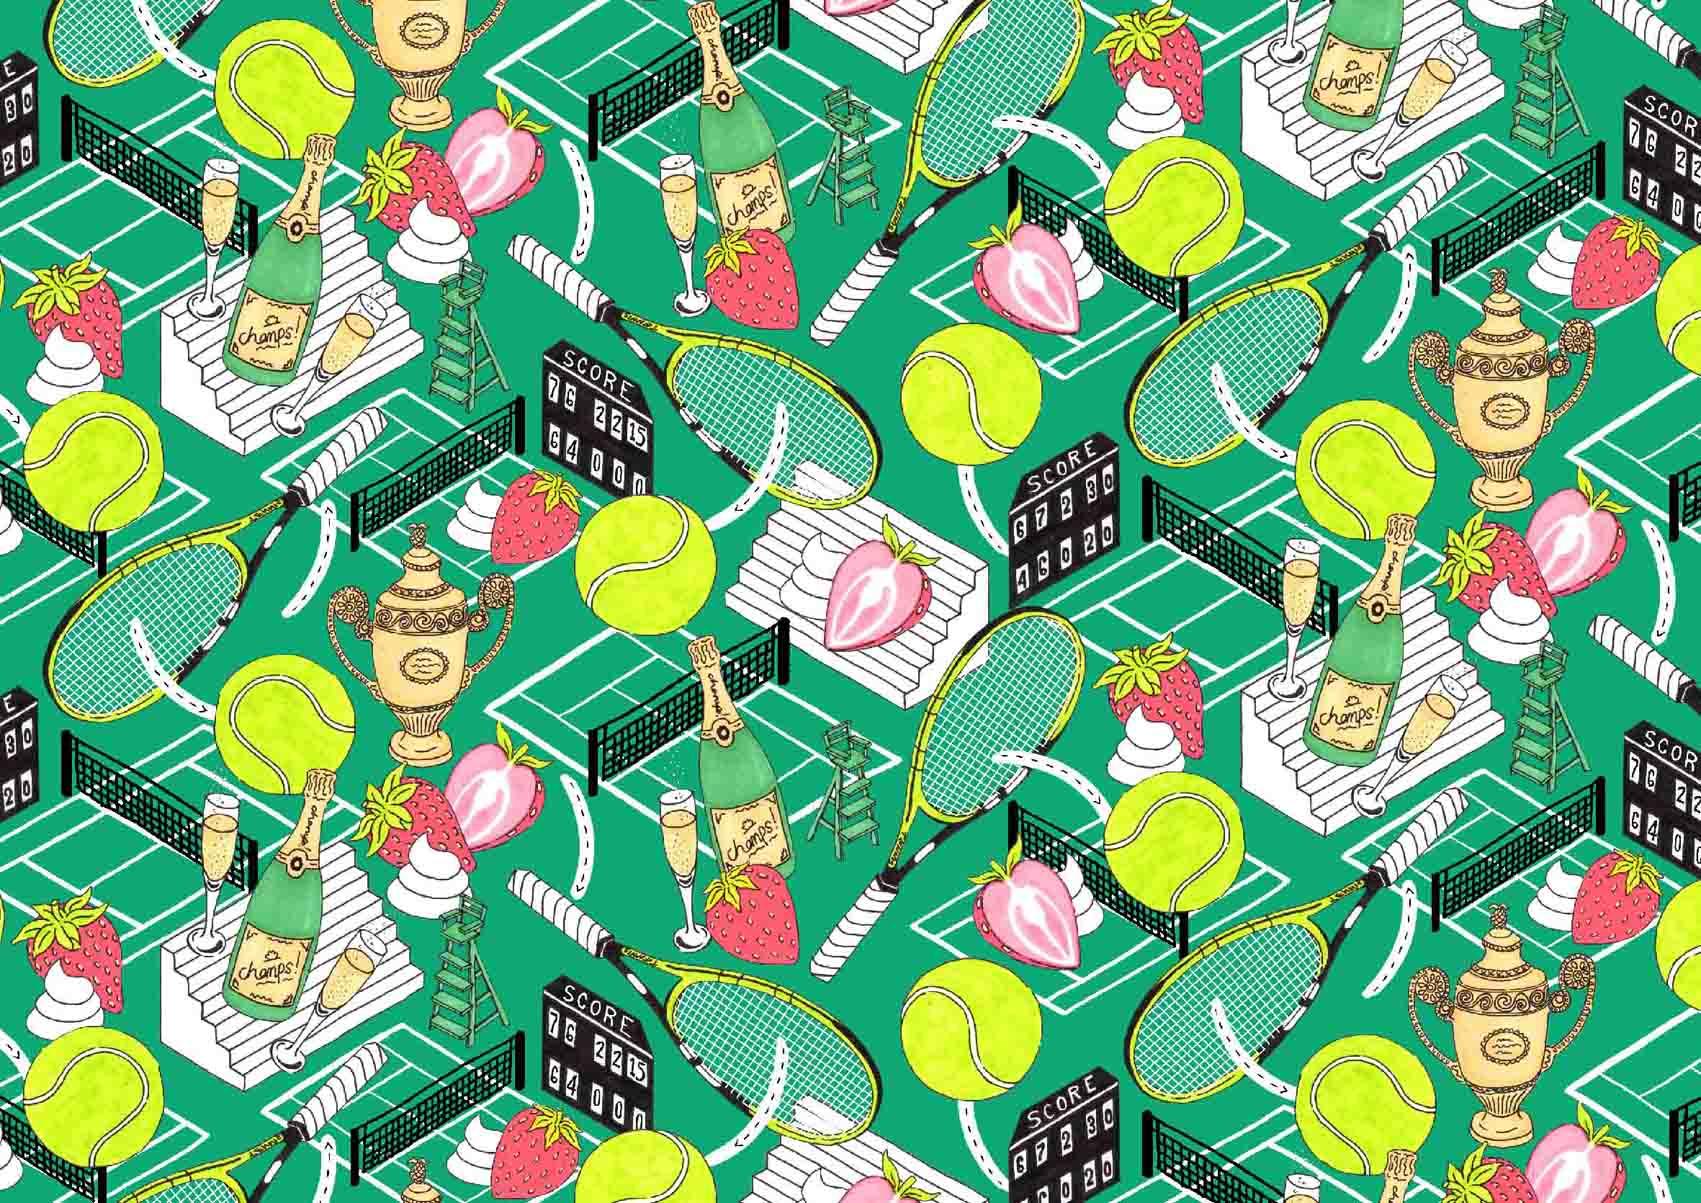 Twitter-Uk-Wimbledon-Tennis-Illustration-Pattern-1-sm.jpg